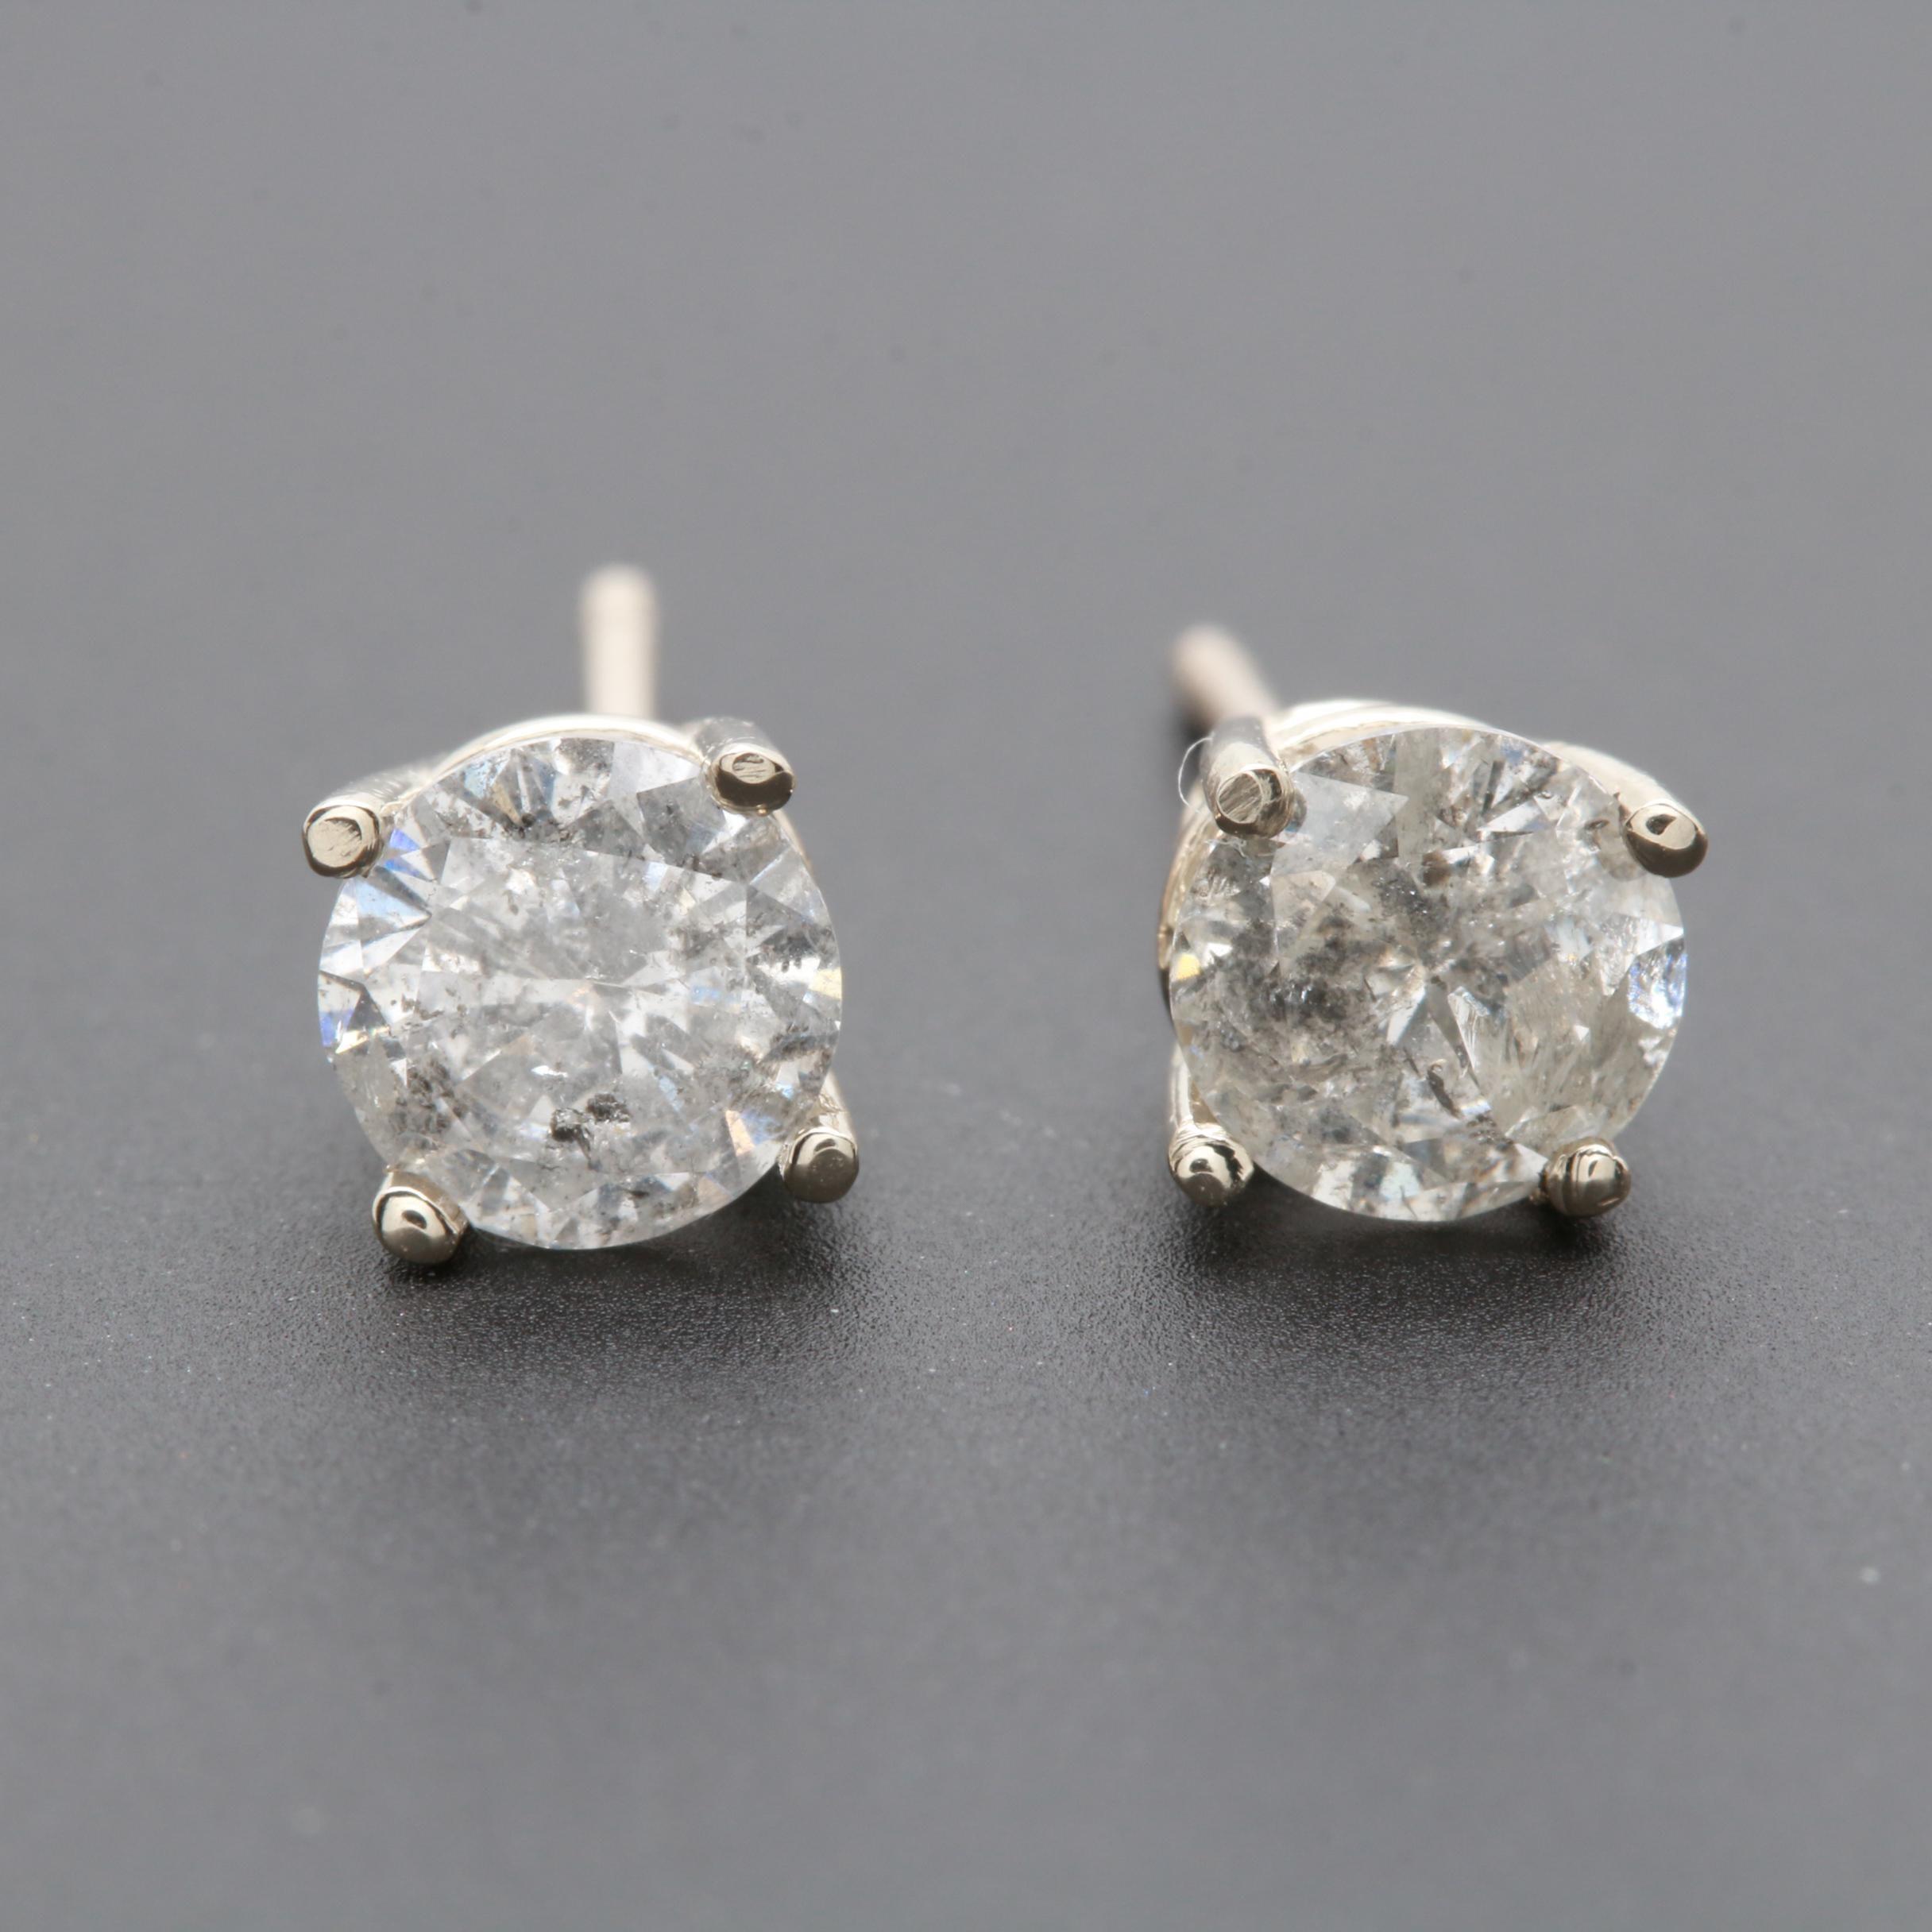 14K White Gold 1.01 CTW Diamond Studs